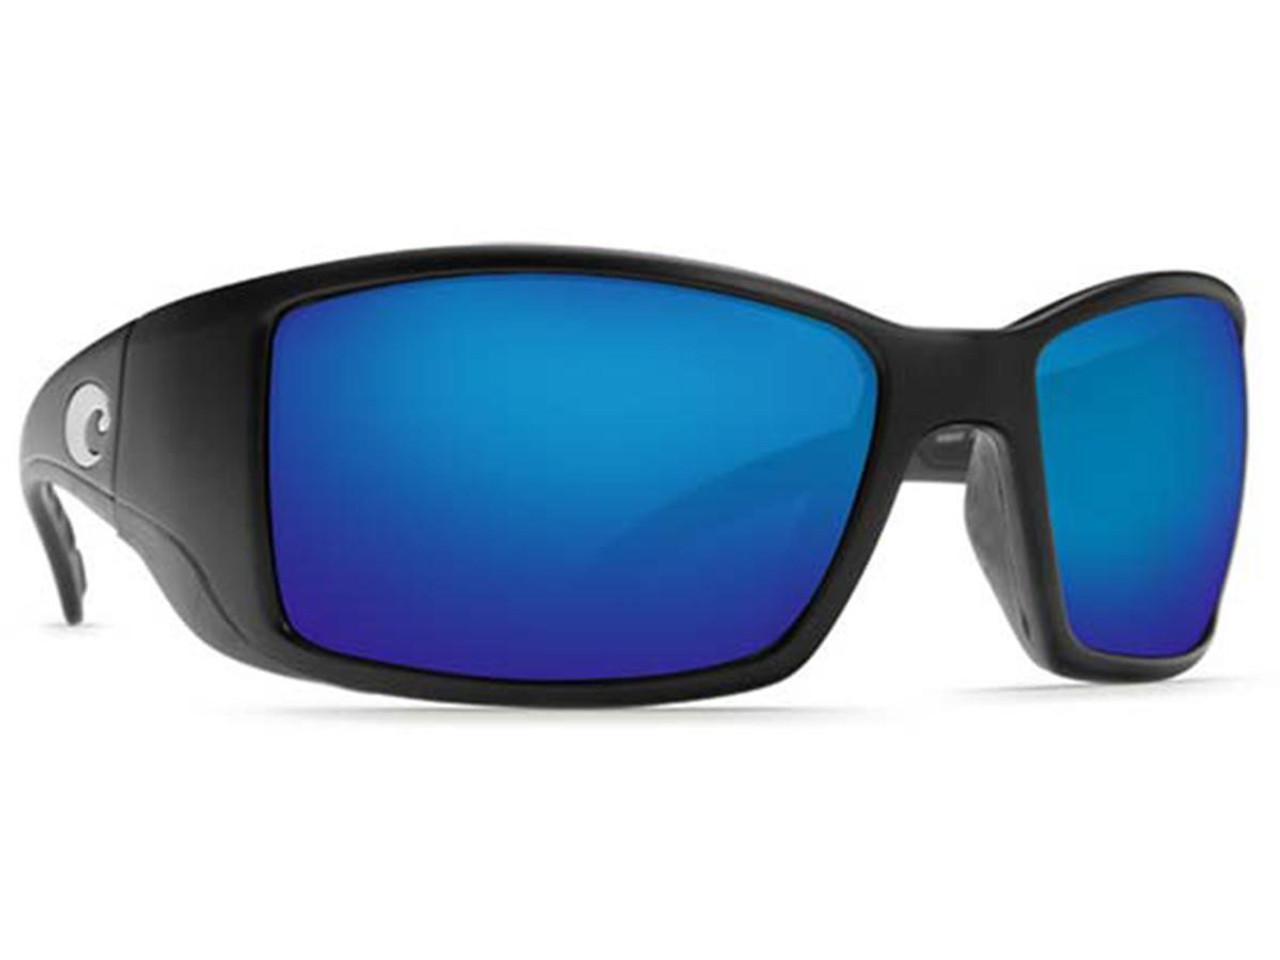 46cc4c1d27 Costa Del Mar - Blackfin Polarized Sunglasses (Color  Matte Black   580p  Blue   Omnifit) - Hero Outdoors